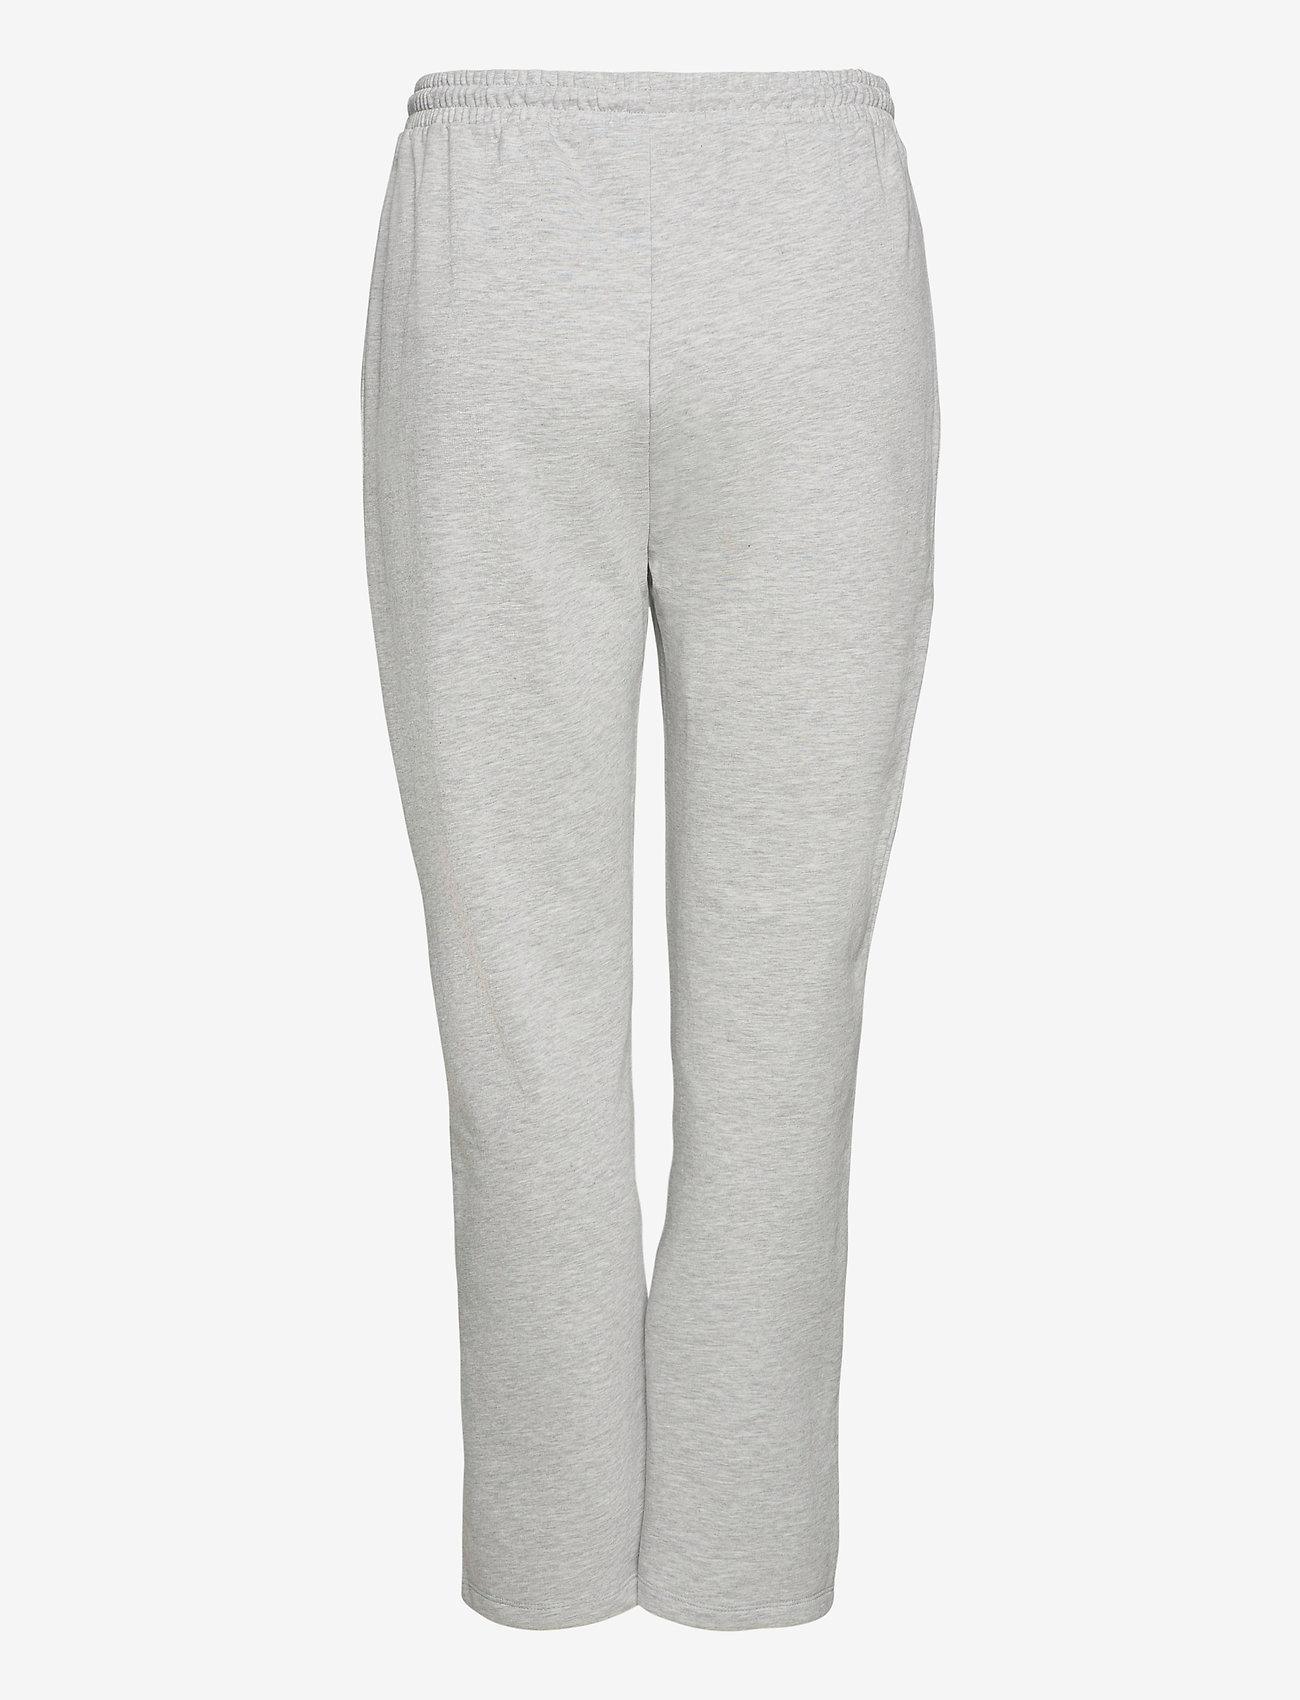 ONLY Carmakoma - CARDELLI LIFE PANTS - sweatpants - light grey melange - 1